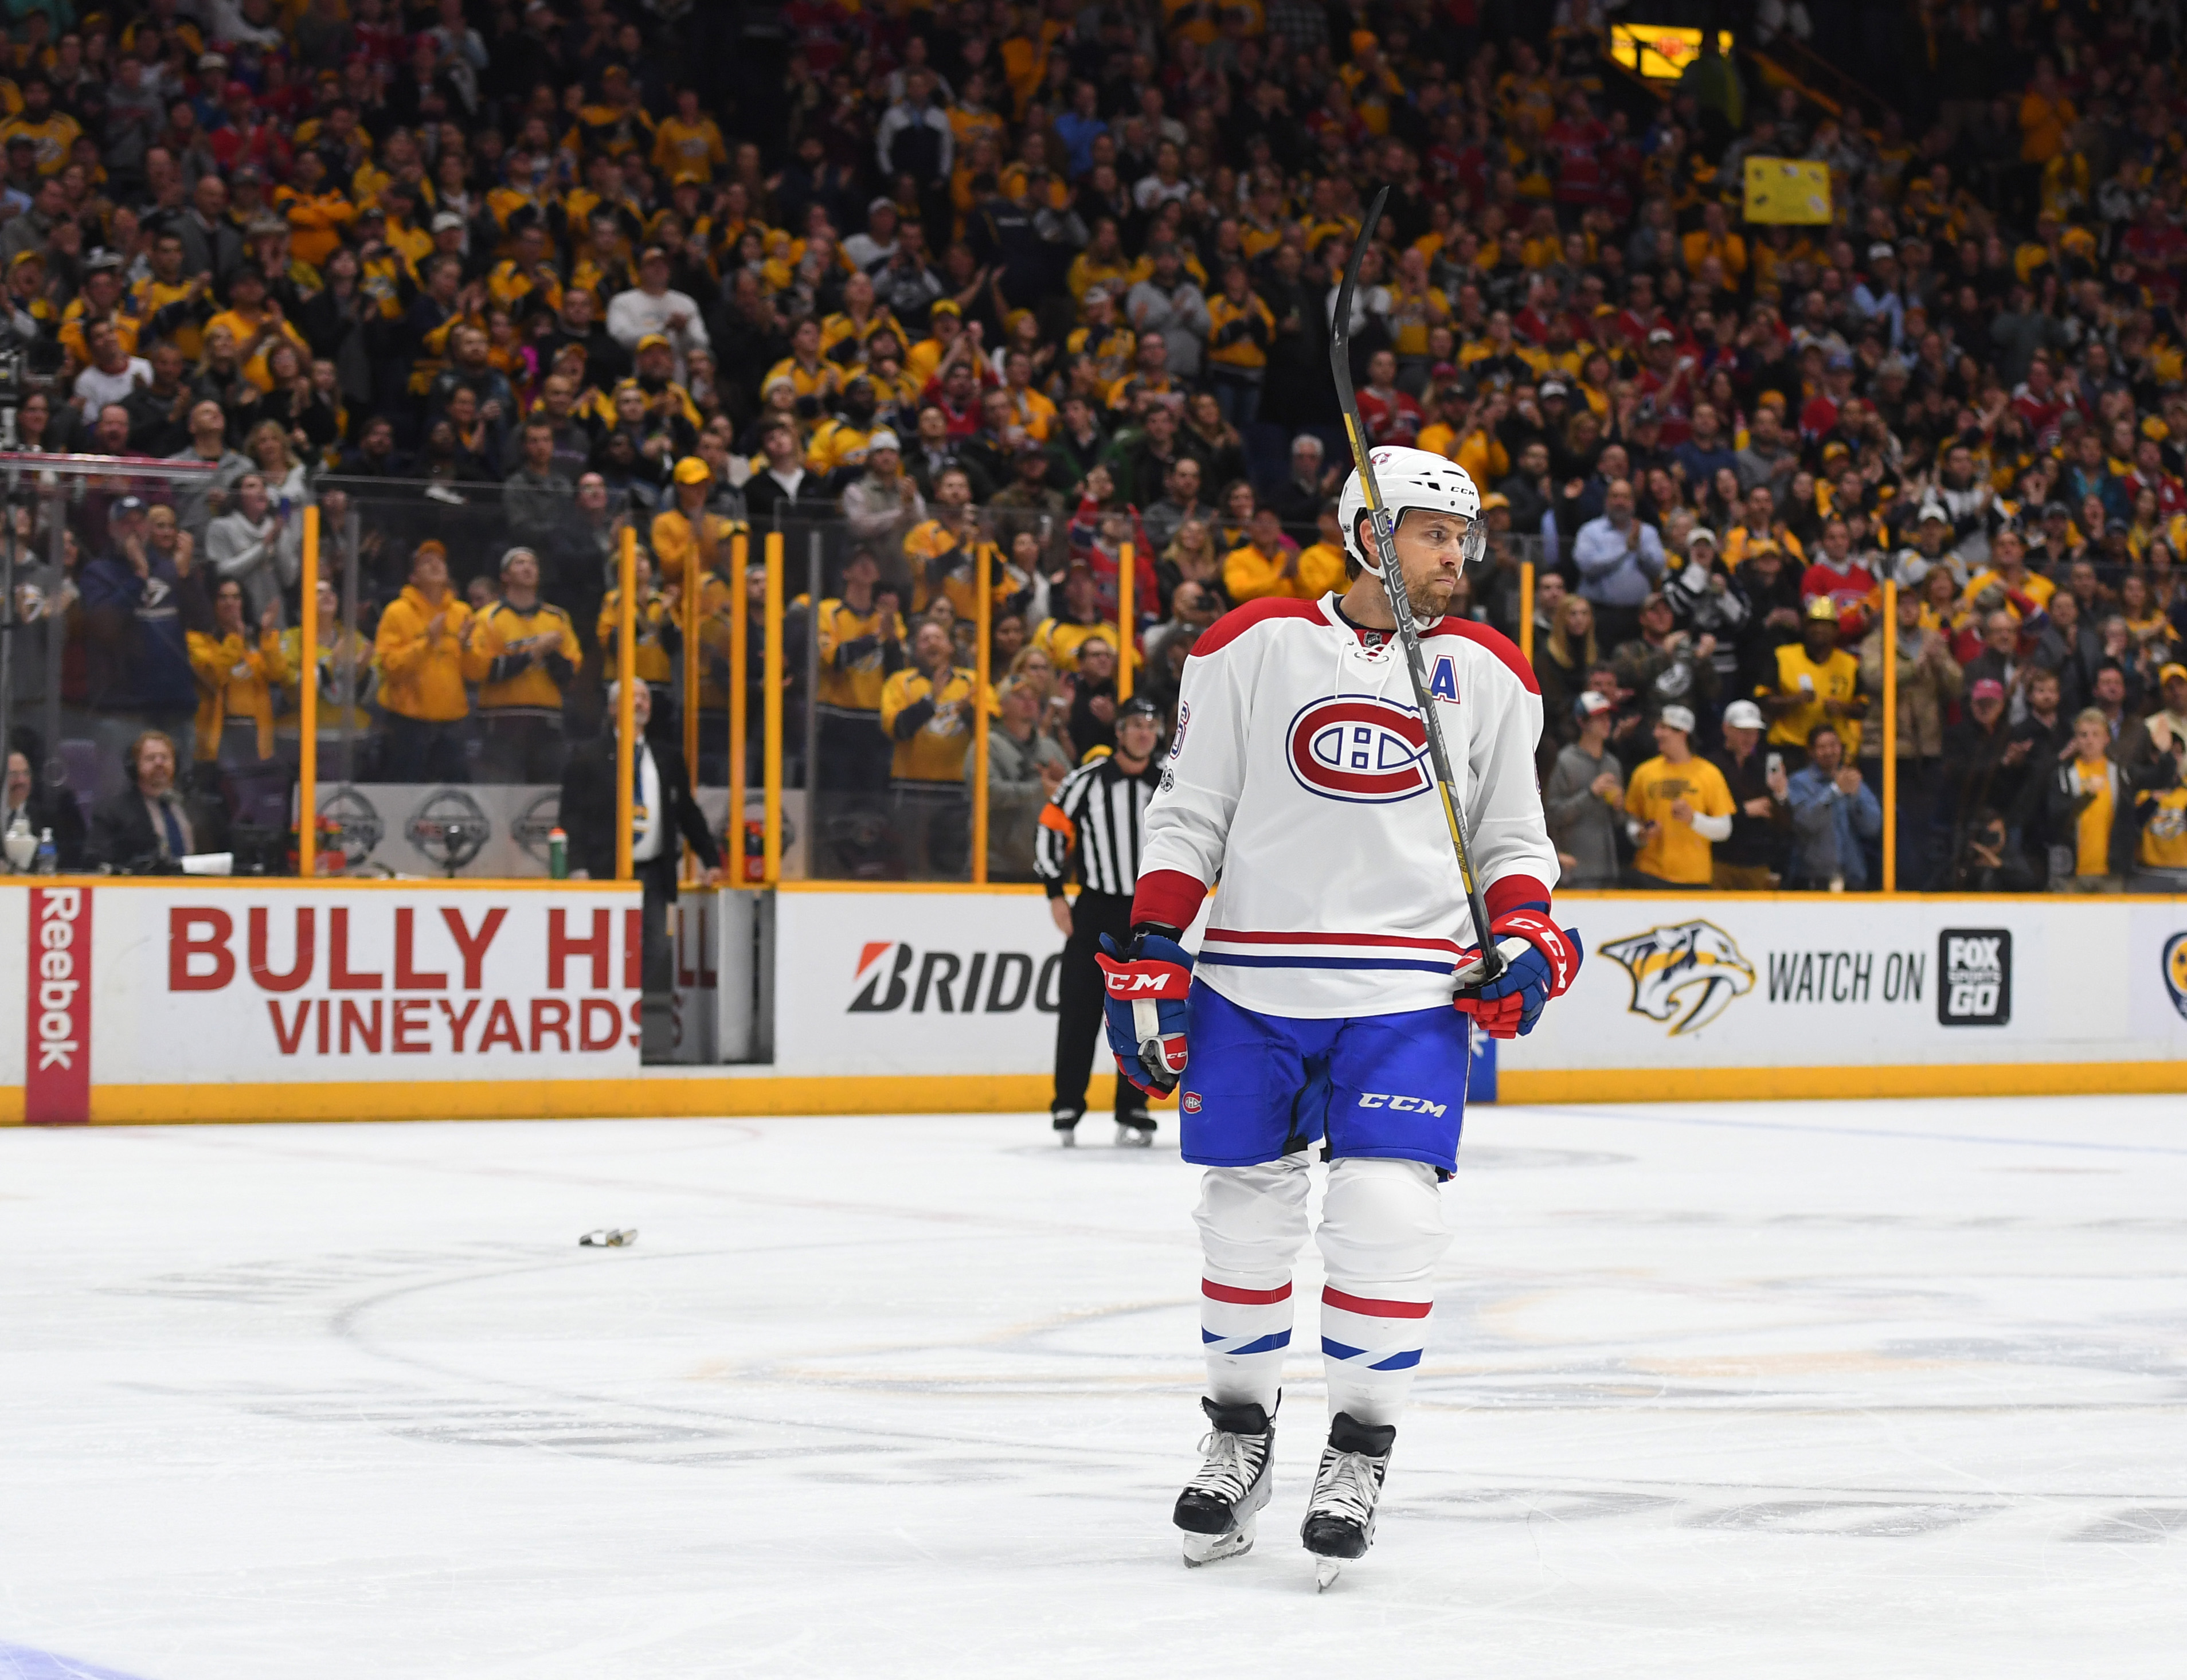 NHL: Montreal Canadiens at Nashville Predators